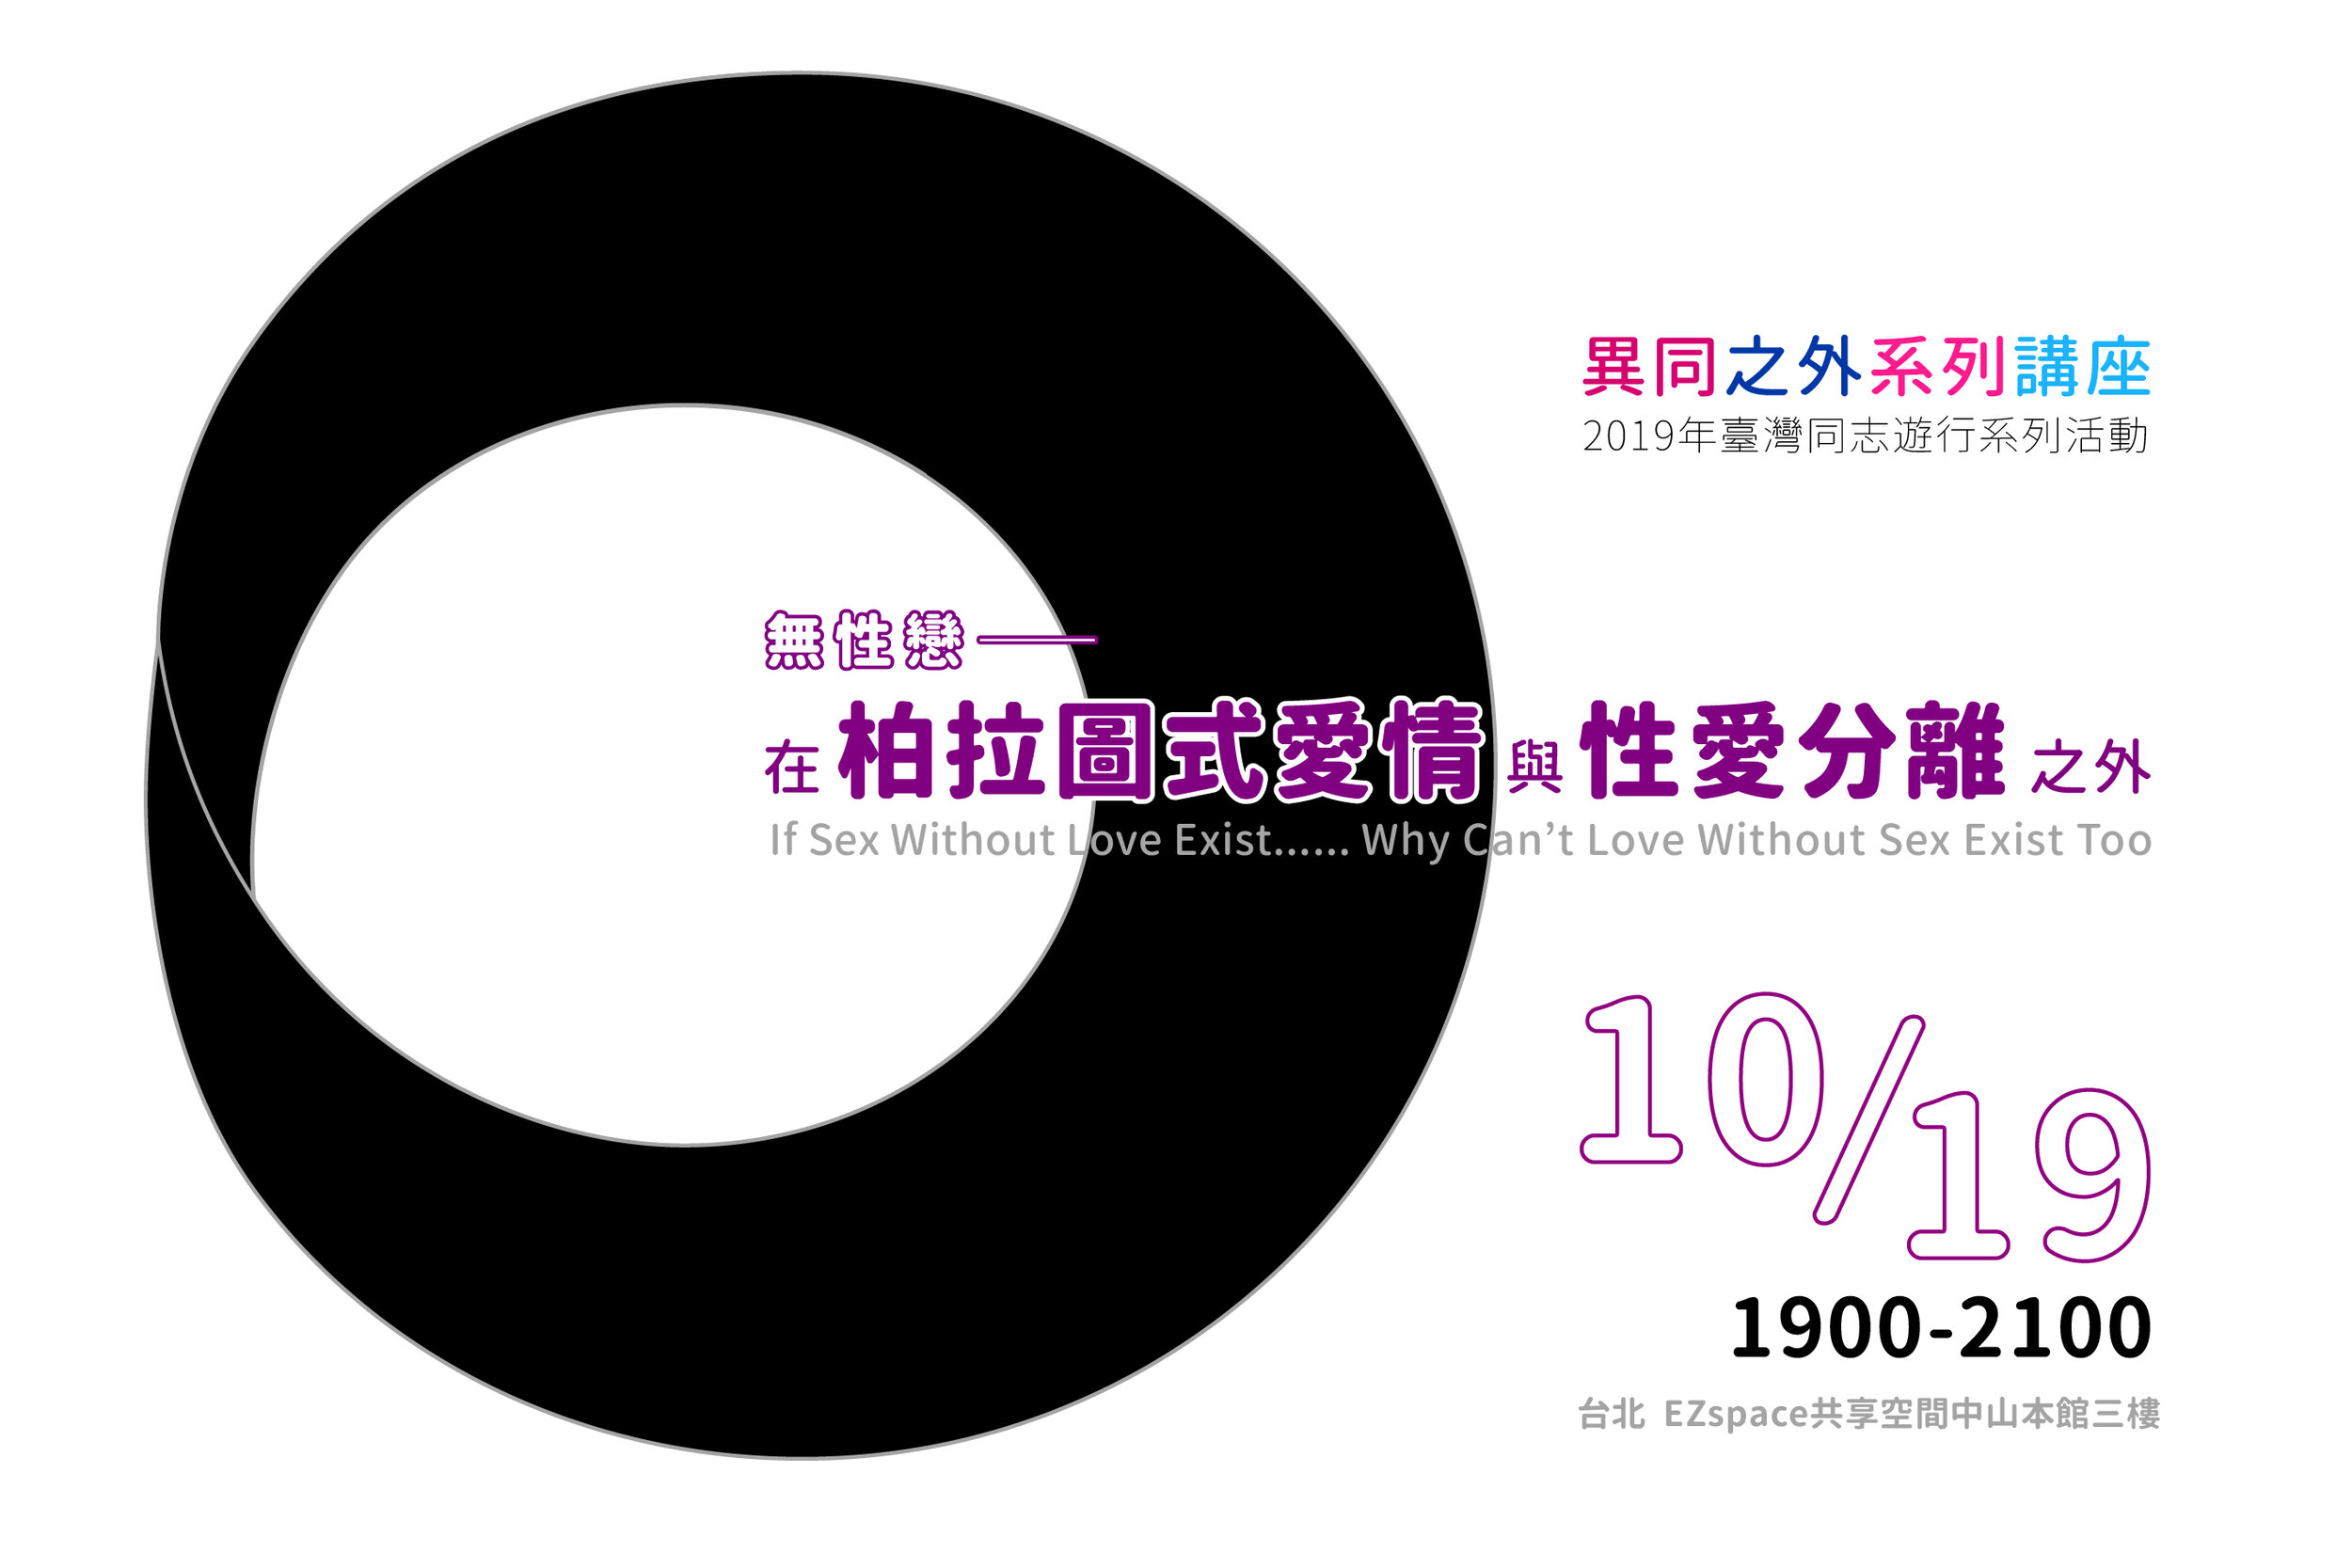 12_Bi the Way-20191019無性戀講座edm.jpg